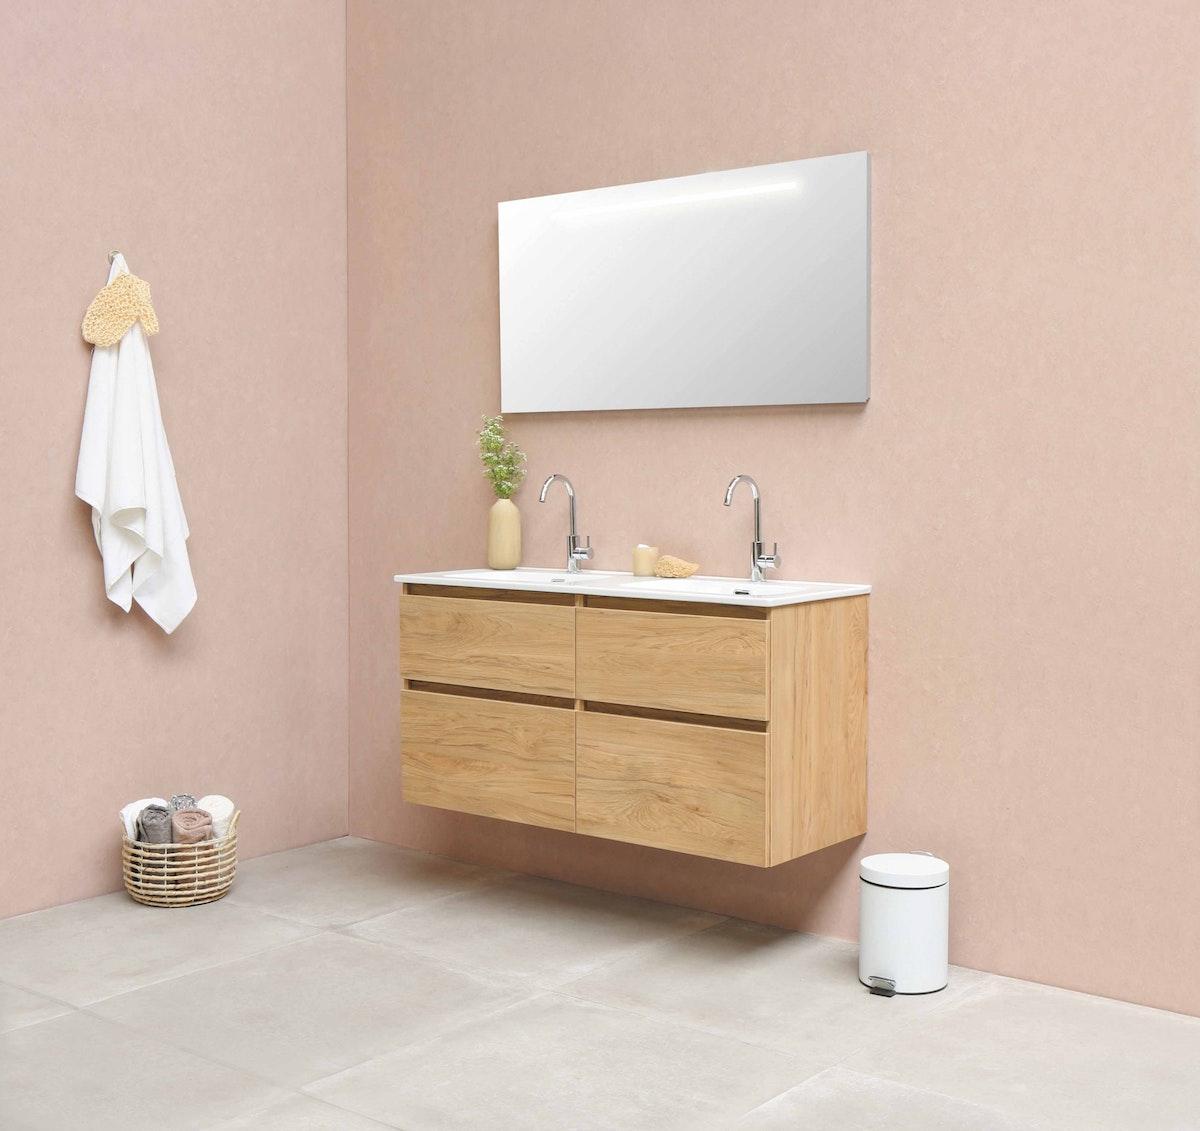 Mounted Bathroom Vanity Birch